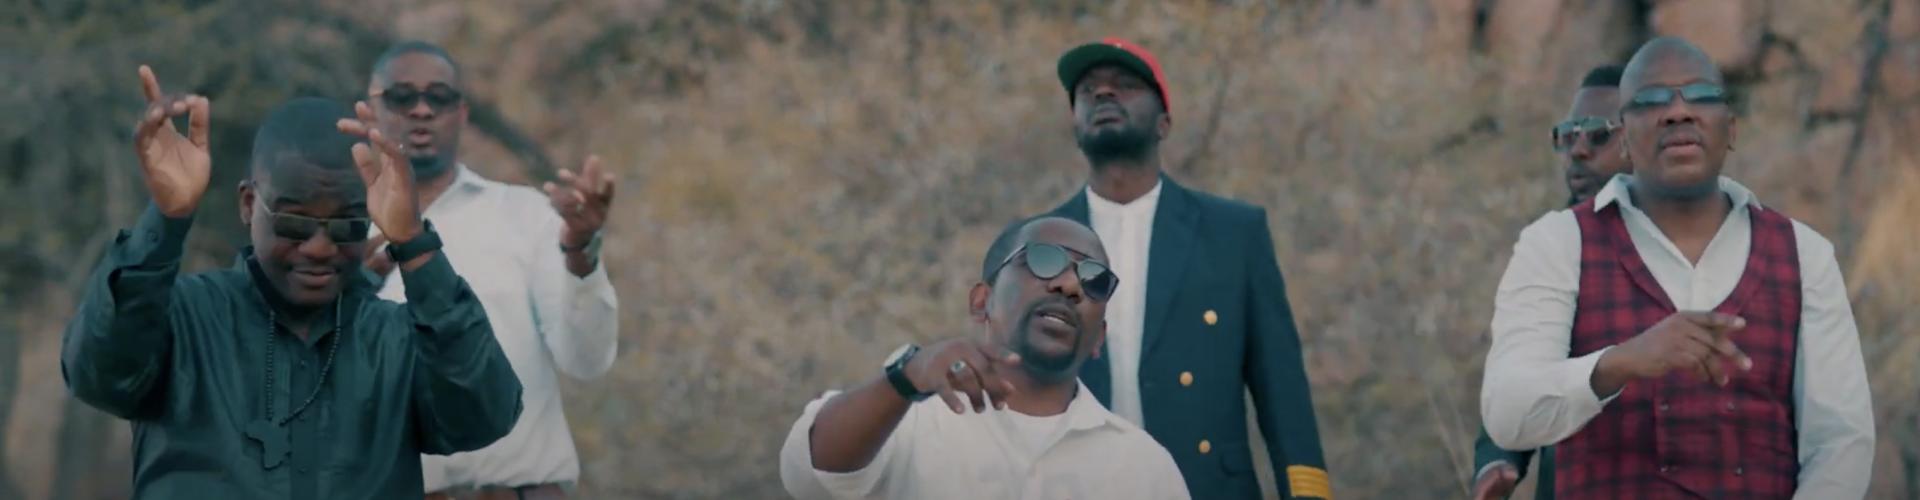 Watch C-RU's 'Knock Harder' – feat Magilo, Q-rap, Drak, HT & Apollo D